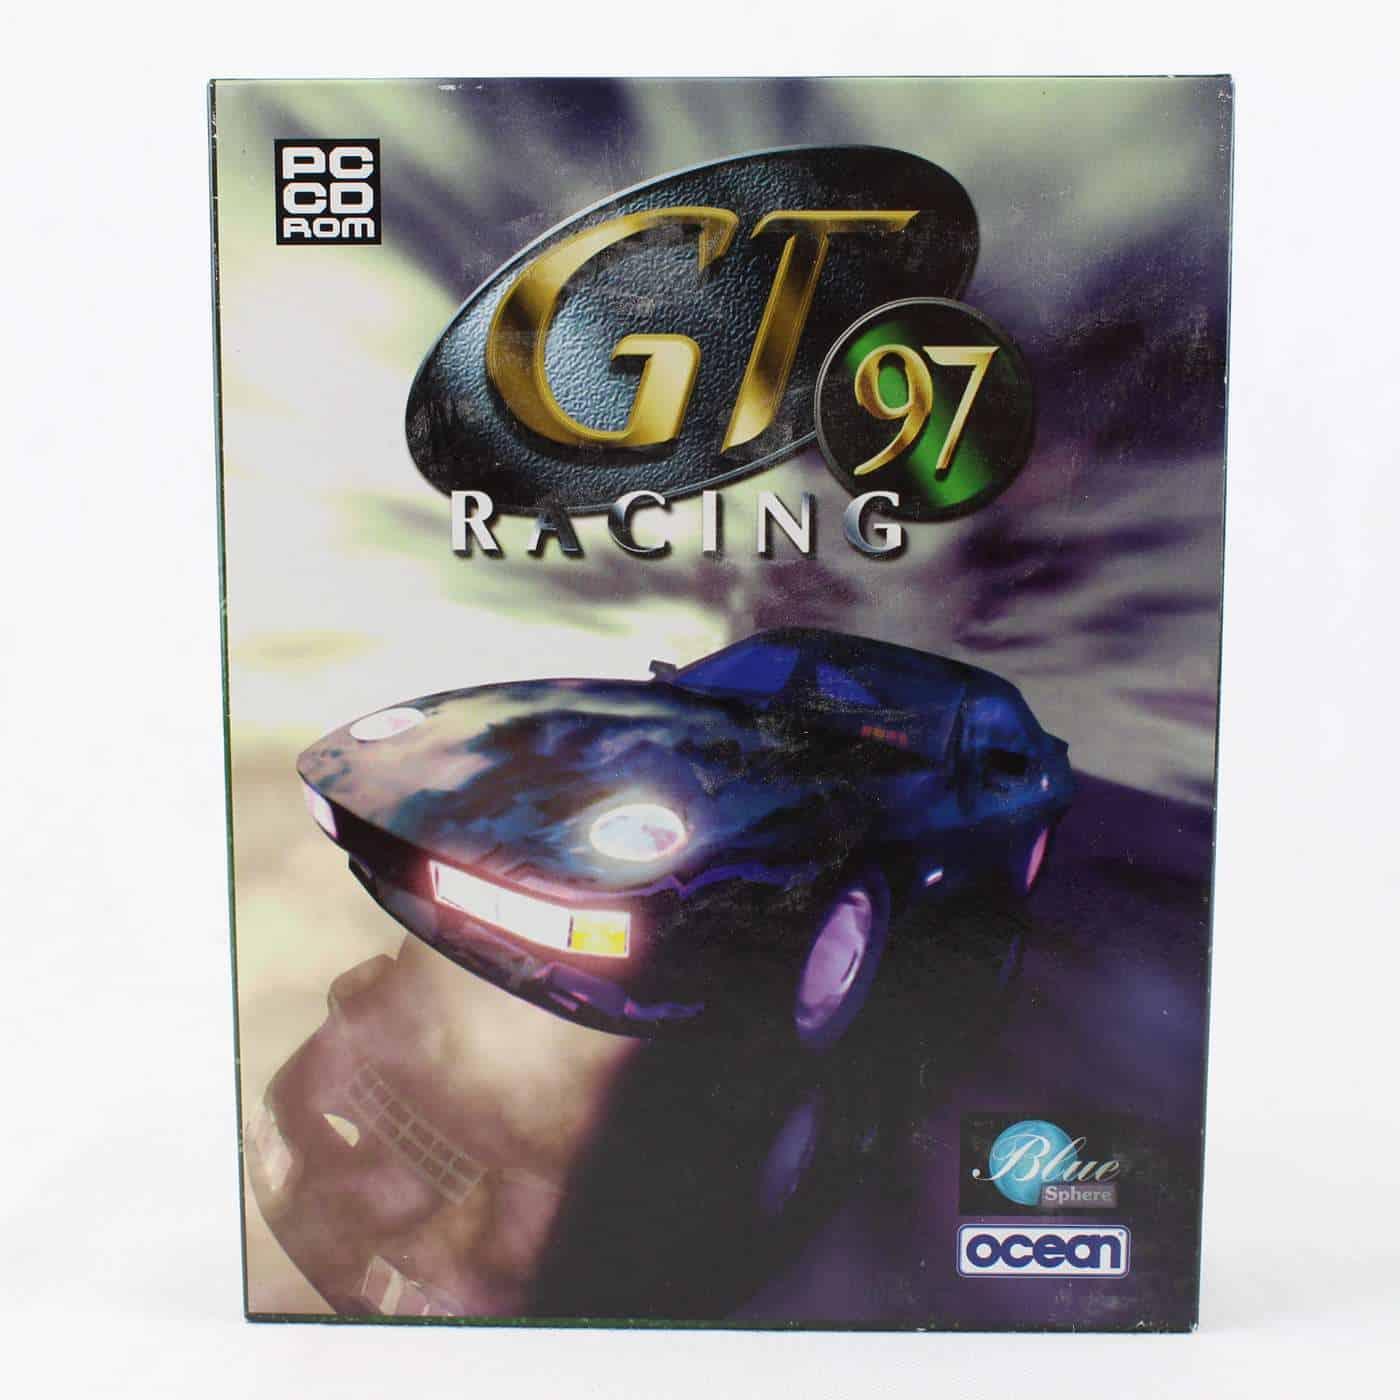 GT Racing 97 (PC Big Box, 1997, Blue Sphere)